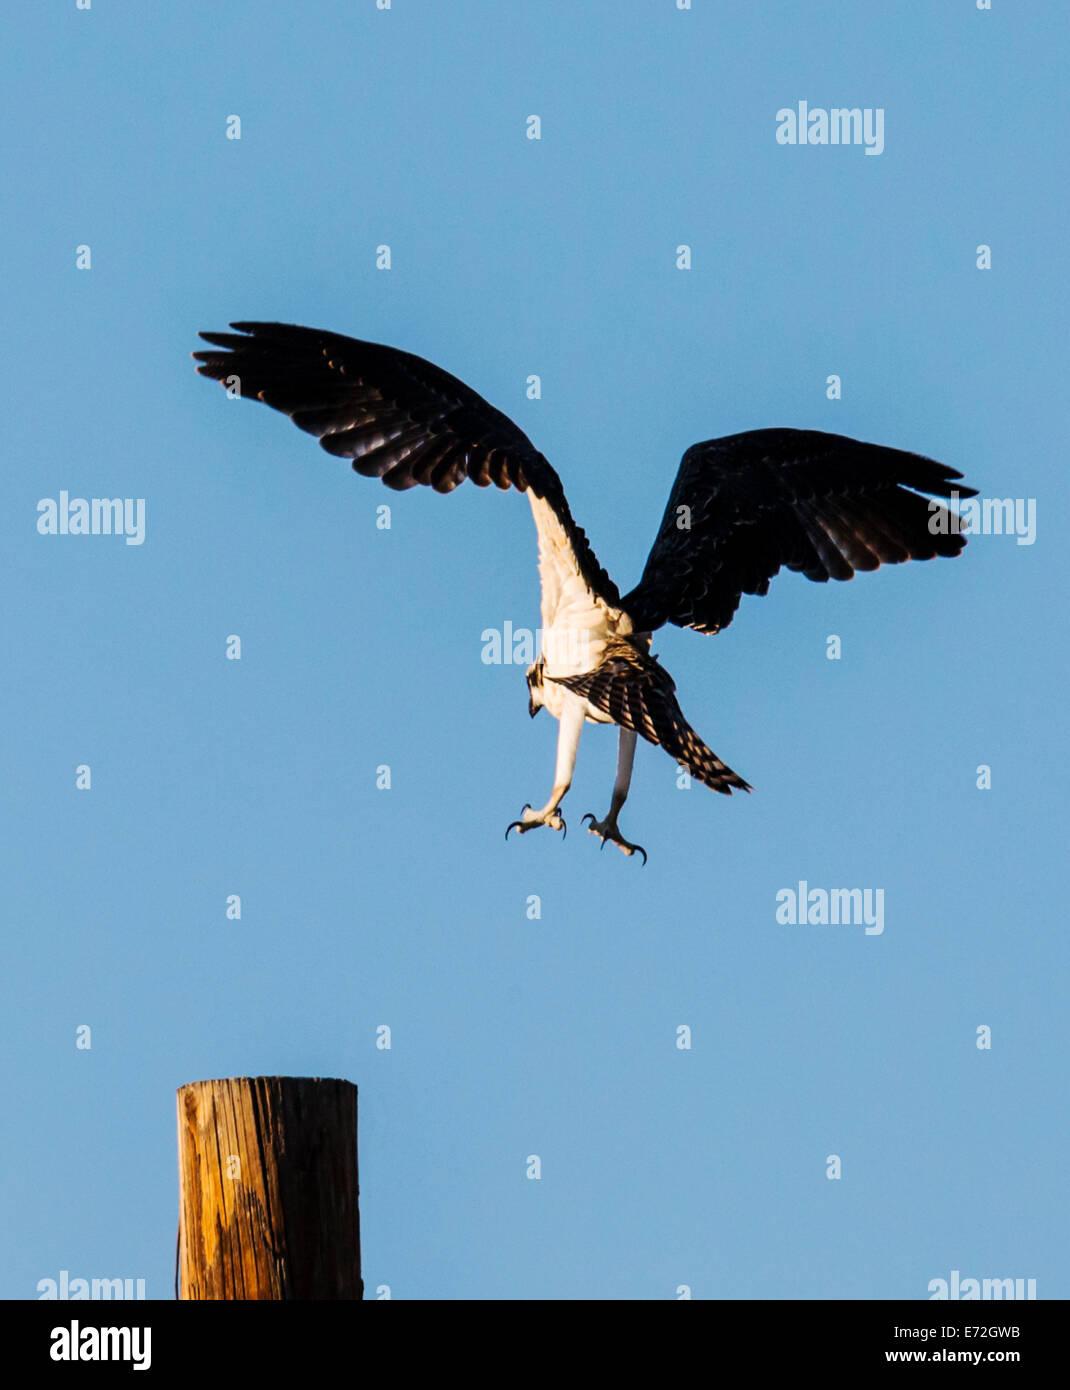 Young Osprey chick in flight, Pandion haliaetus, sea hawk, fish eagle, river hawk, fish hawk, raptor, Chaffee County, - Stock Image